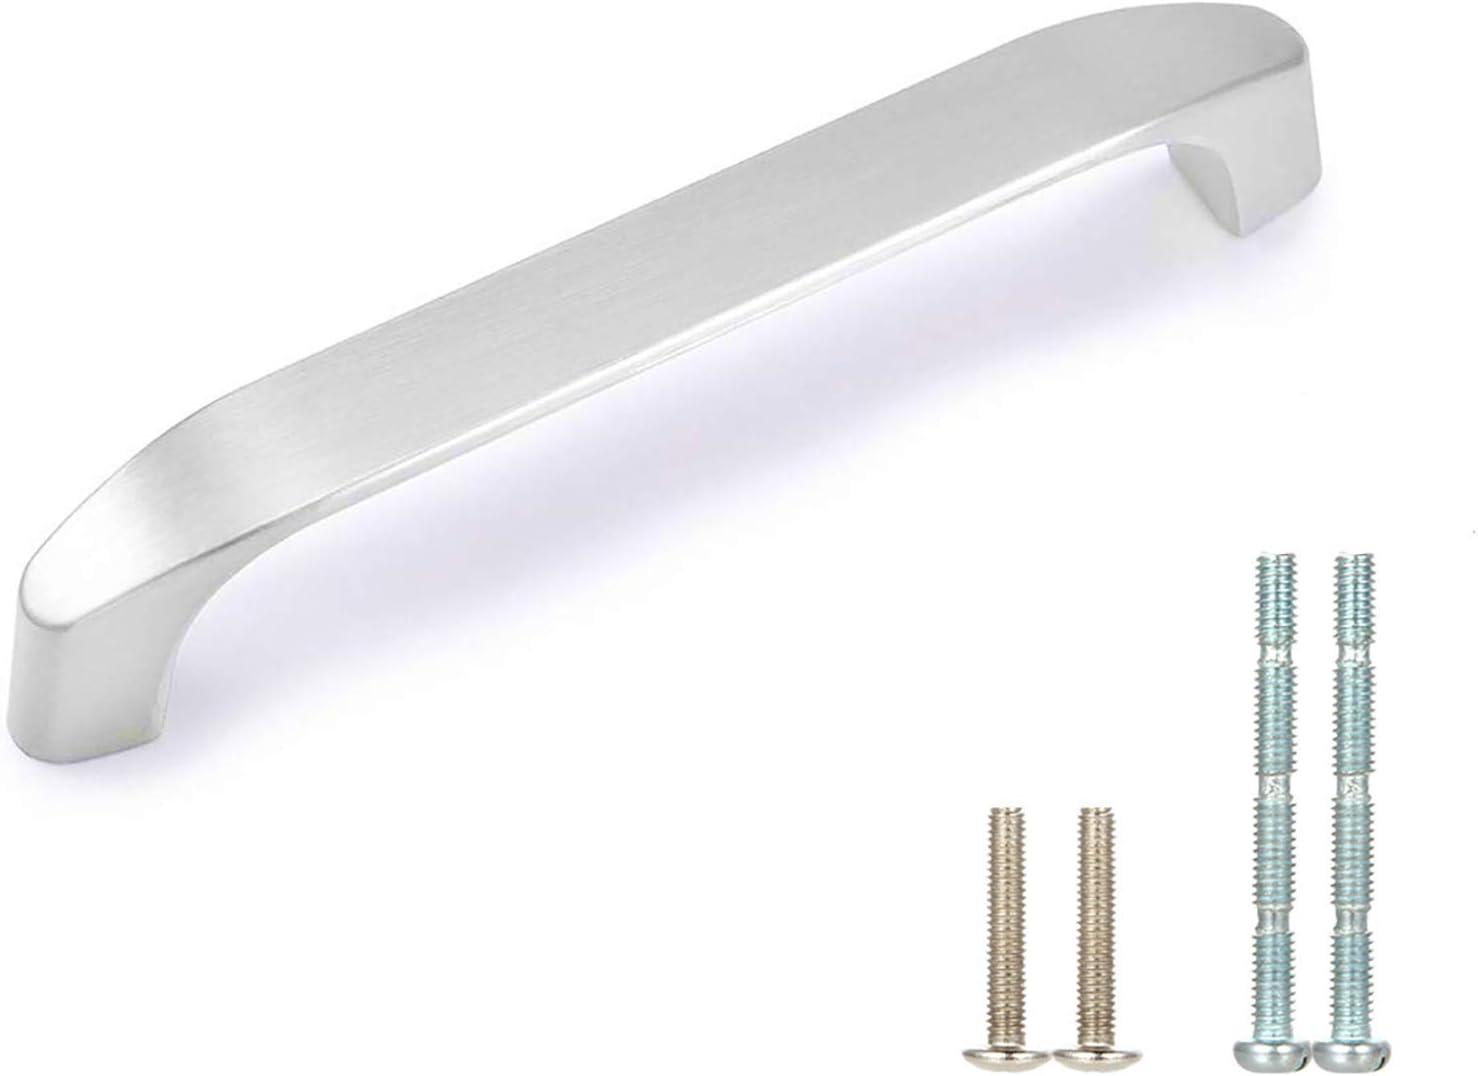 "WEAVERBIRD 96mm Cabinet Handles Kitchen Hardware Drawer Pulls - 3-3/4"" Hole Centers-Stain Nickel - Pack of 10"